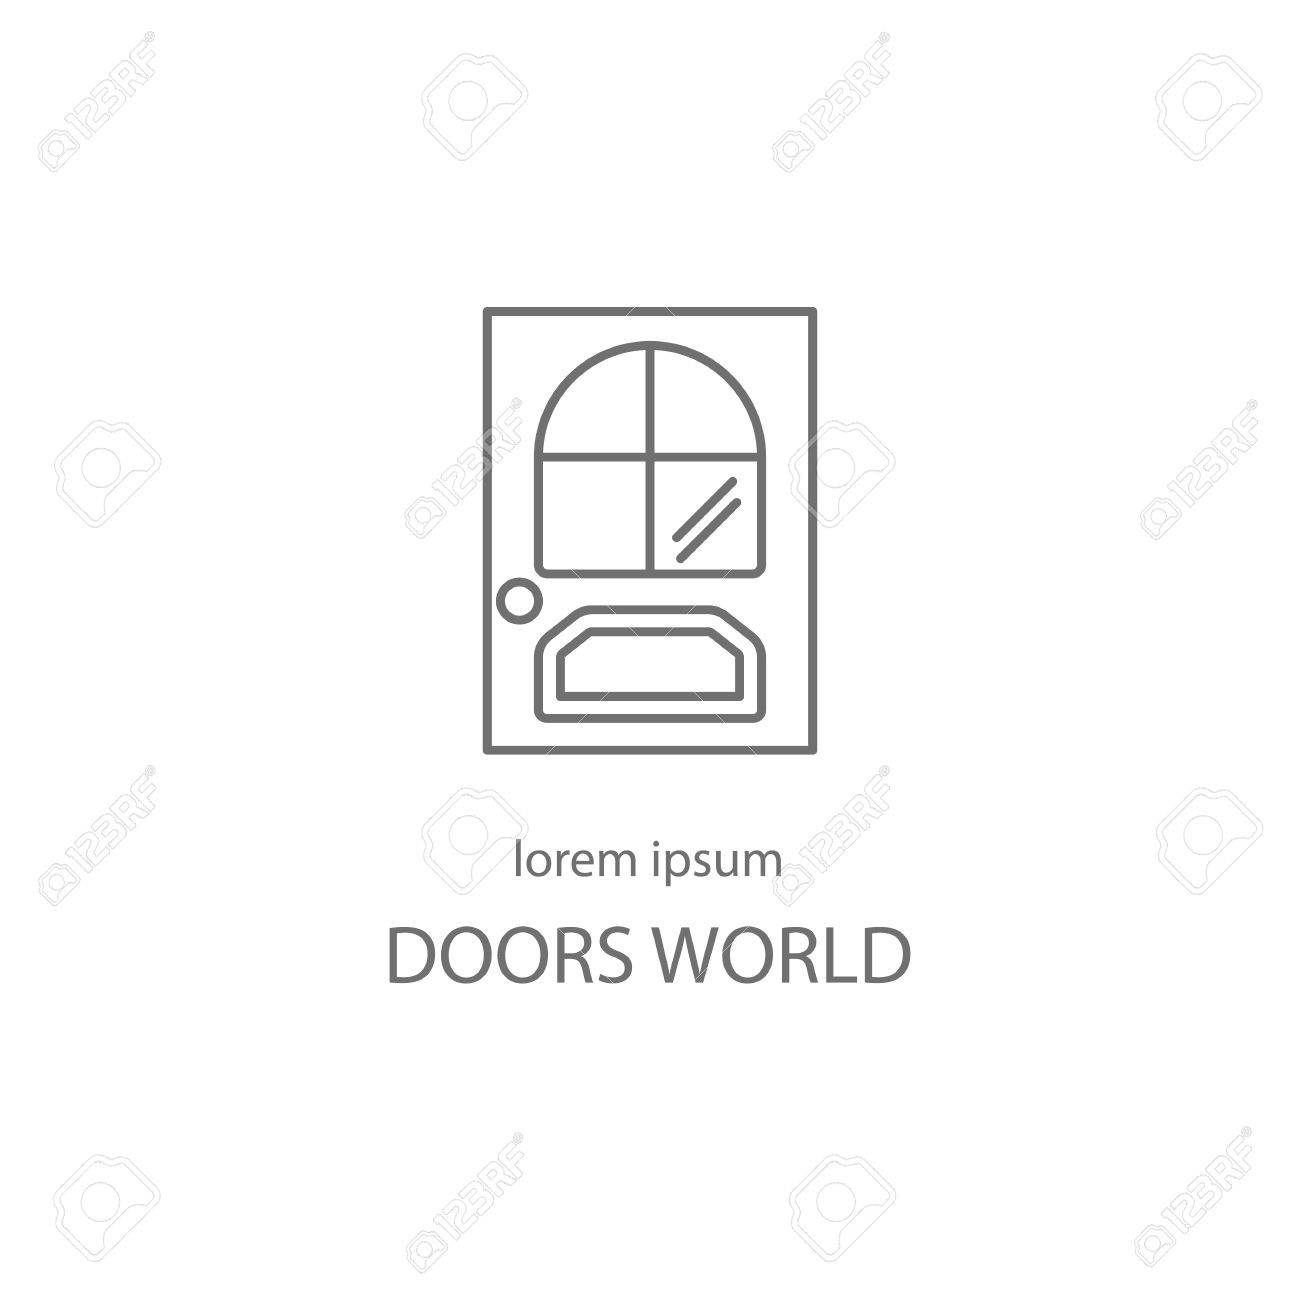 Door Line Icon Logotype Design Templates. Modern Easy To Edit ...